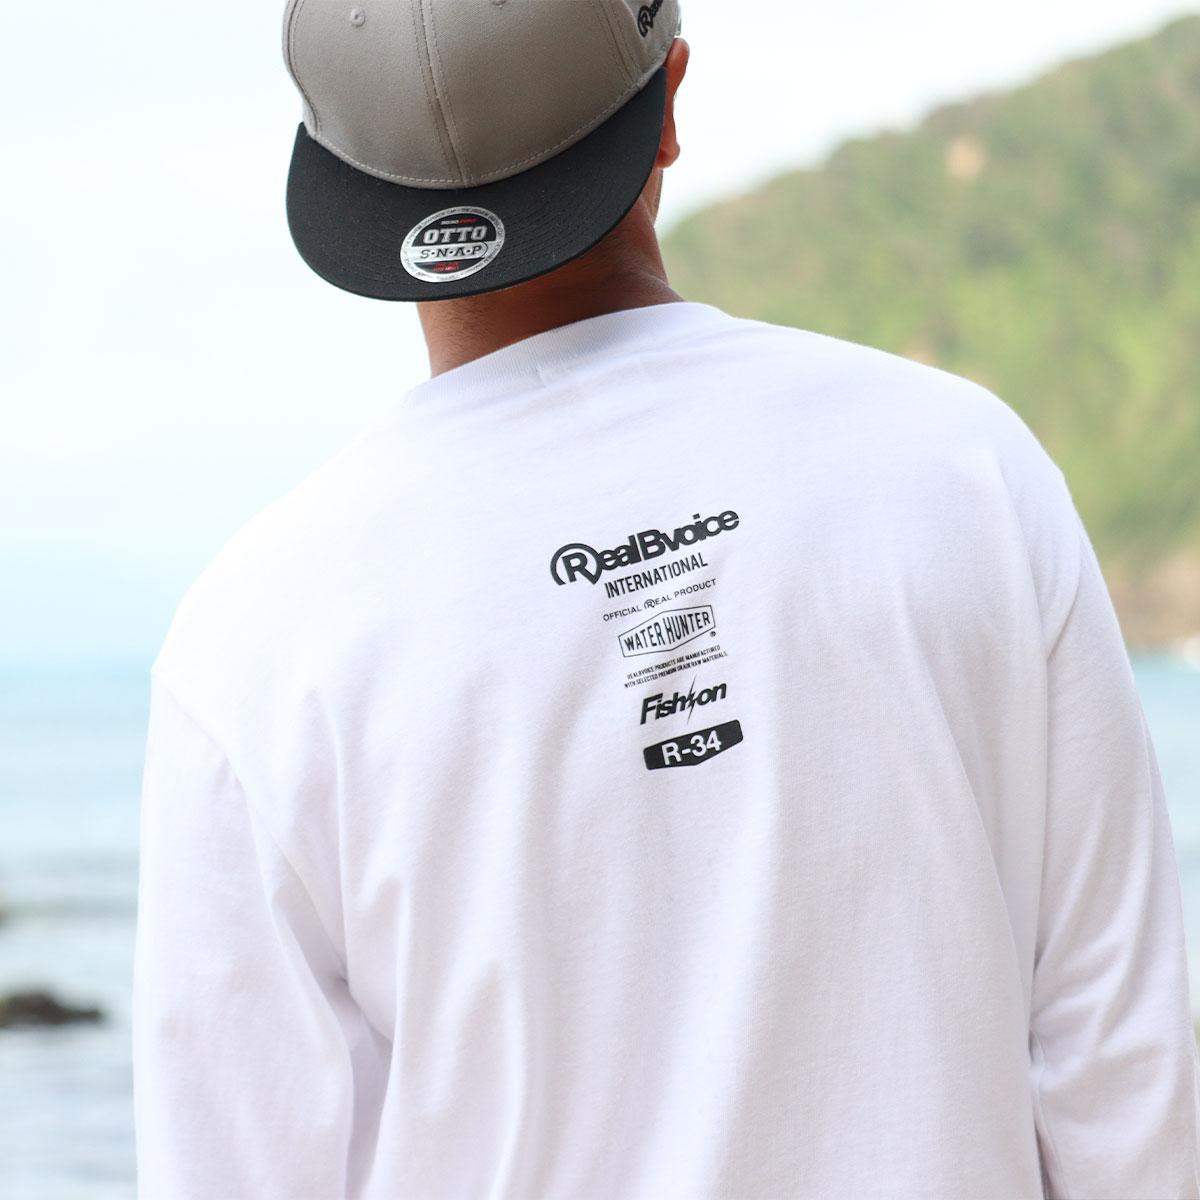 FISHING CAMOUFLAGE LONG T-SHIRT